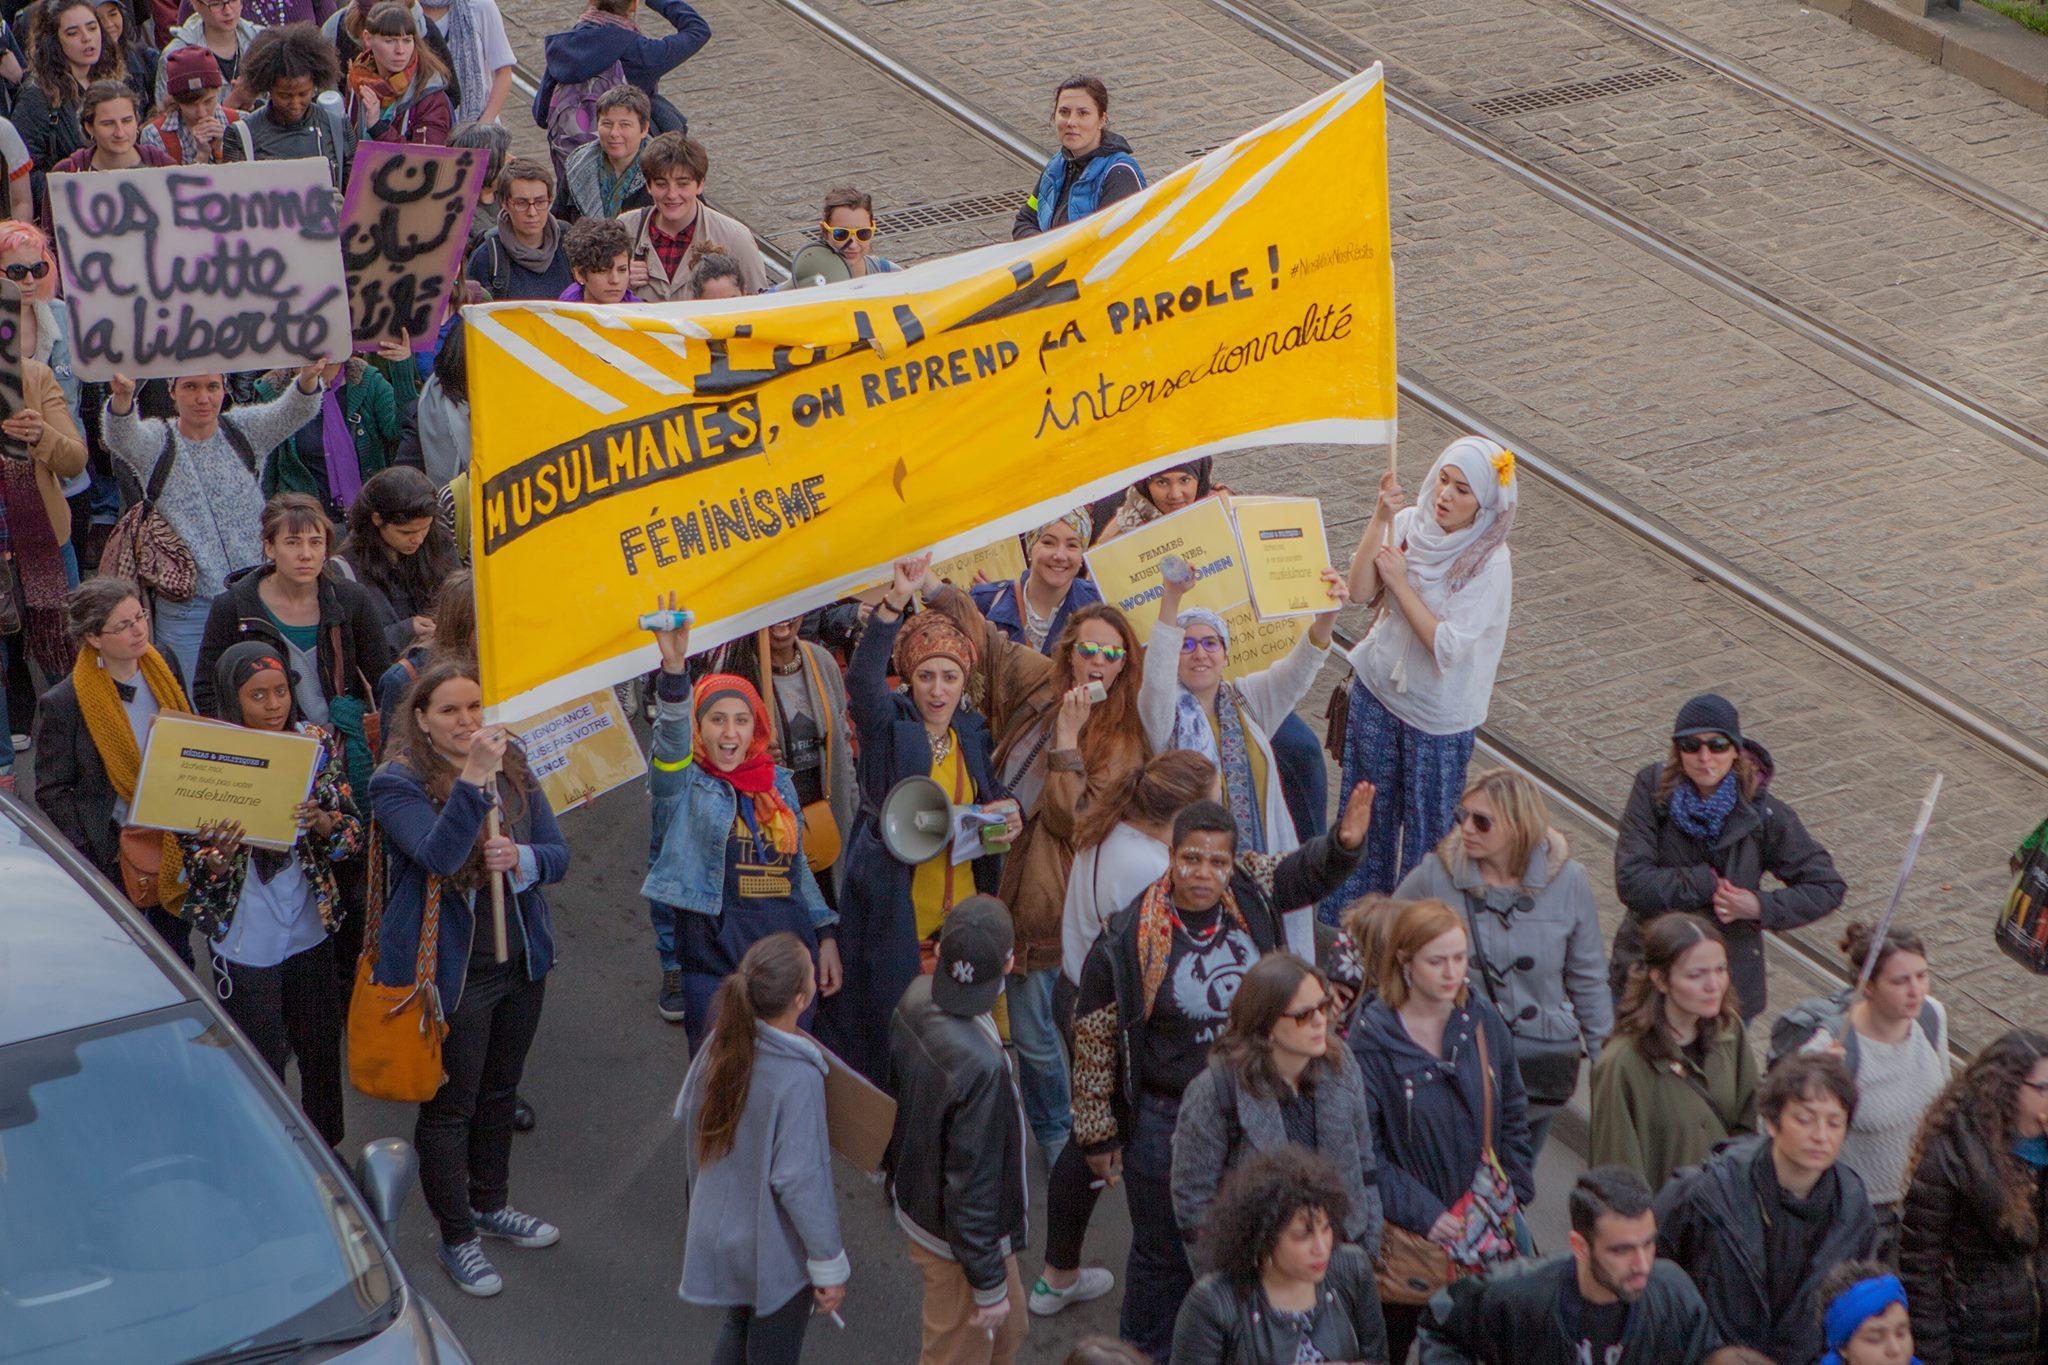 Lallab Manifestation féministe 11 mars 3